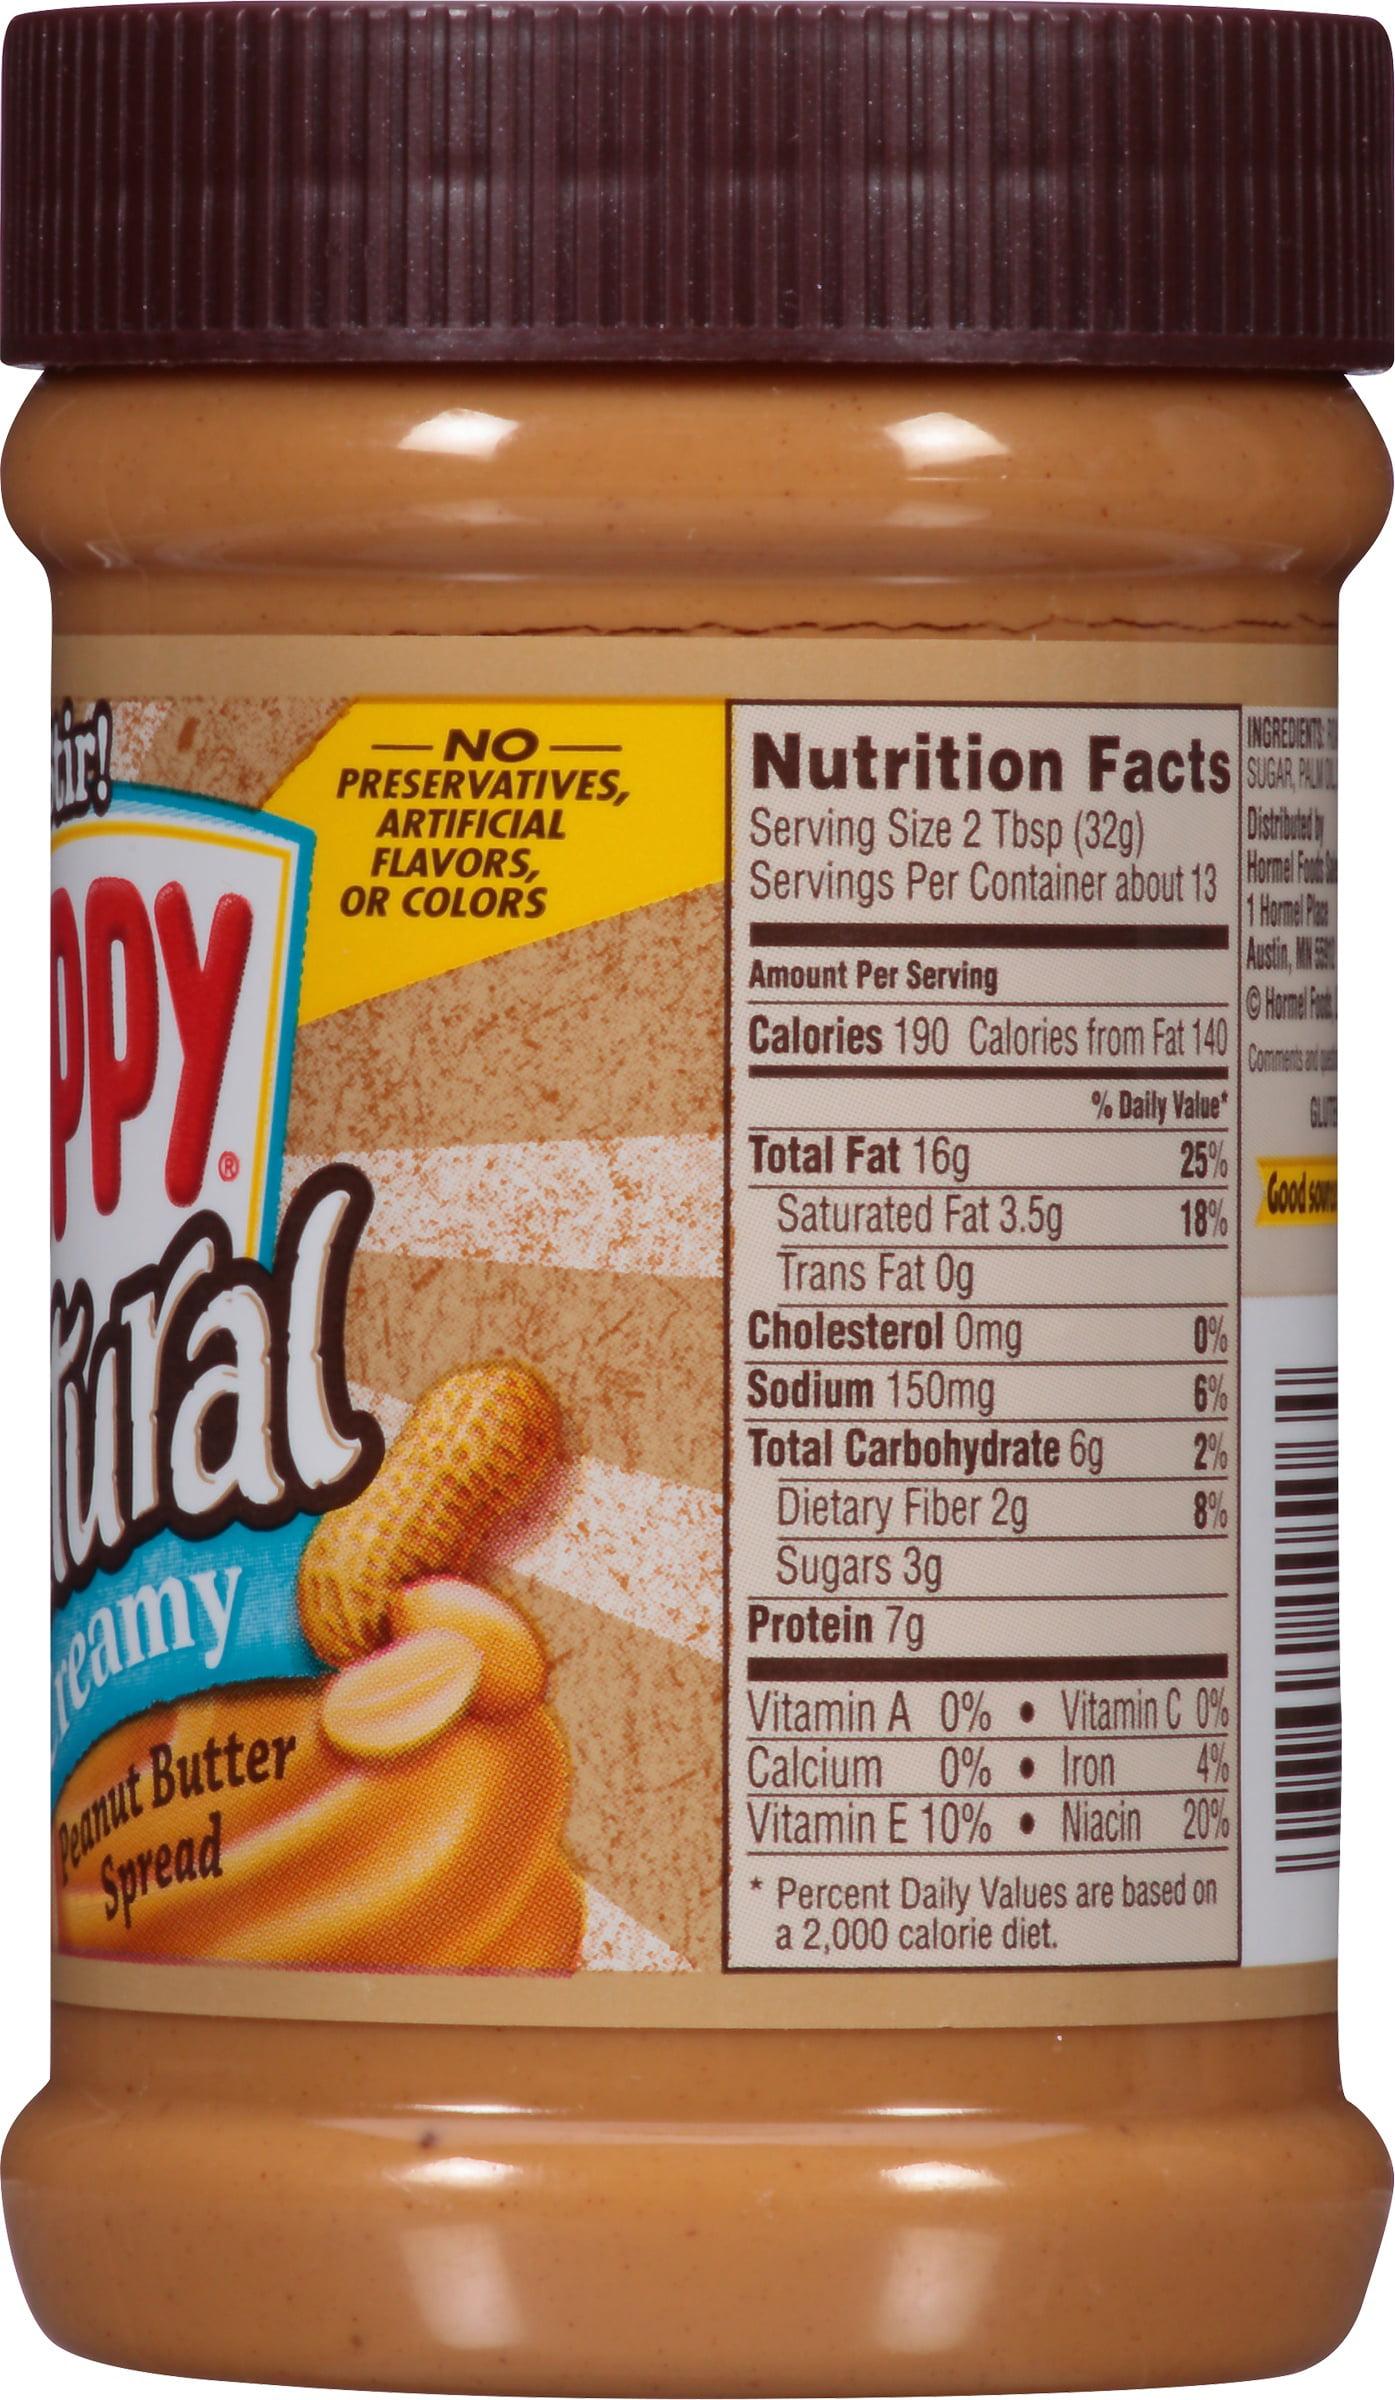 skippy natural creamy peanut butter, 15 oz - walmart